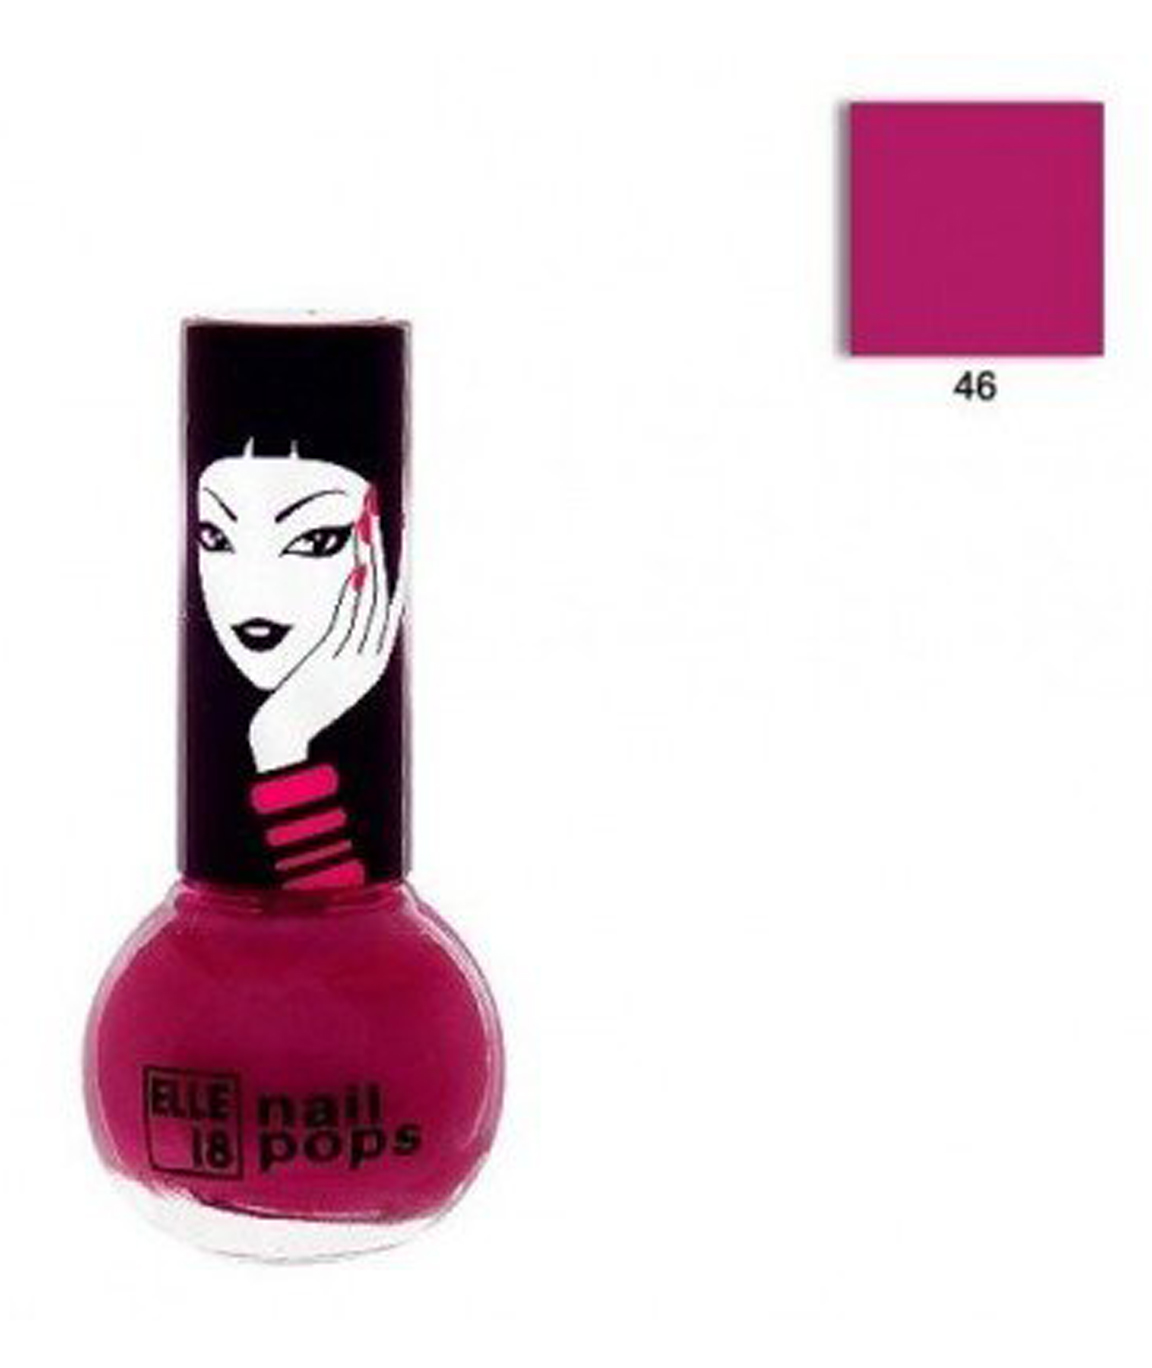 Elle18 Nail Pops - 46 (Pack of 2)